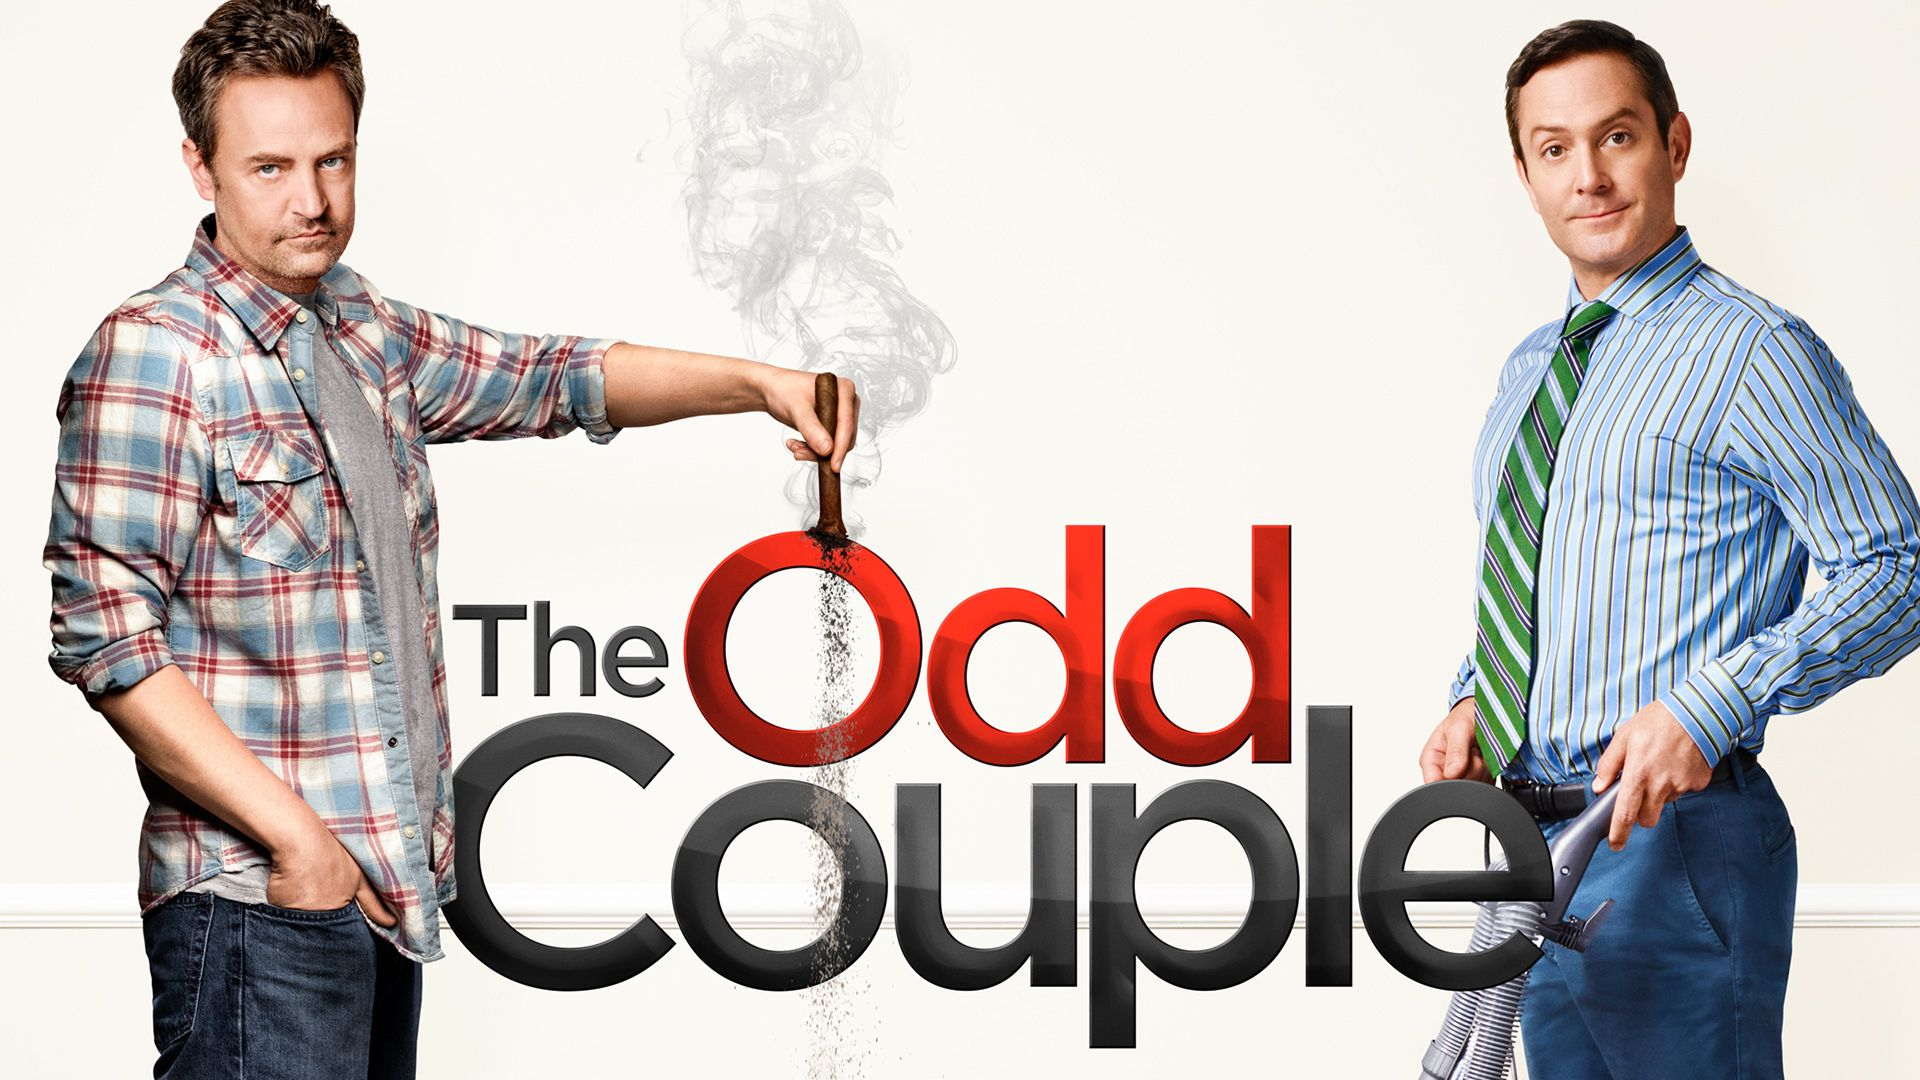 The Odd Couple S01